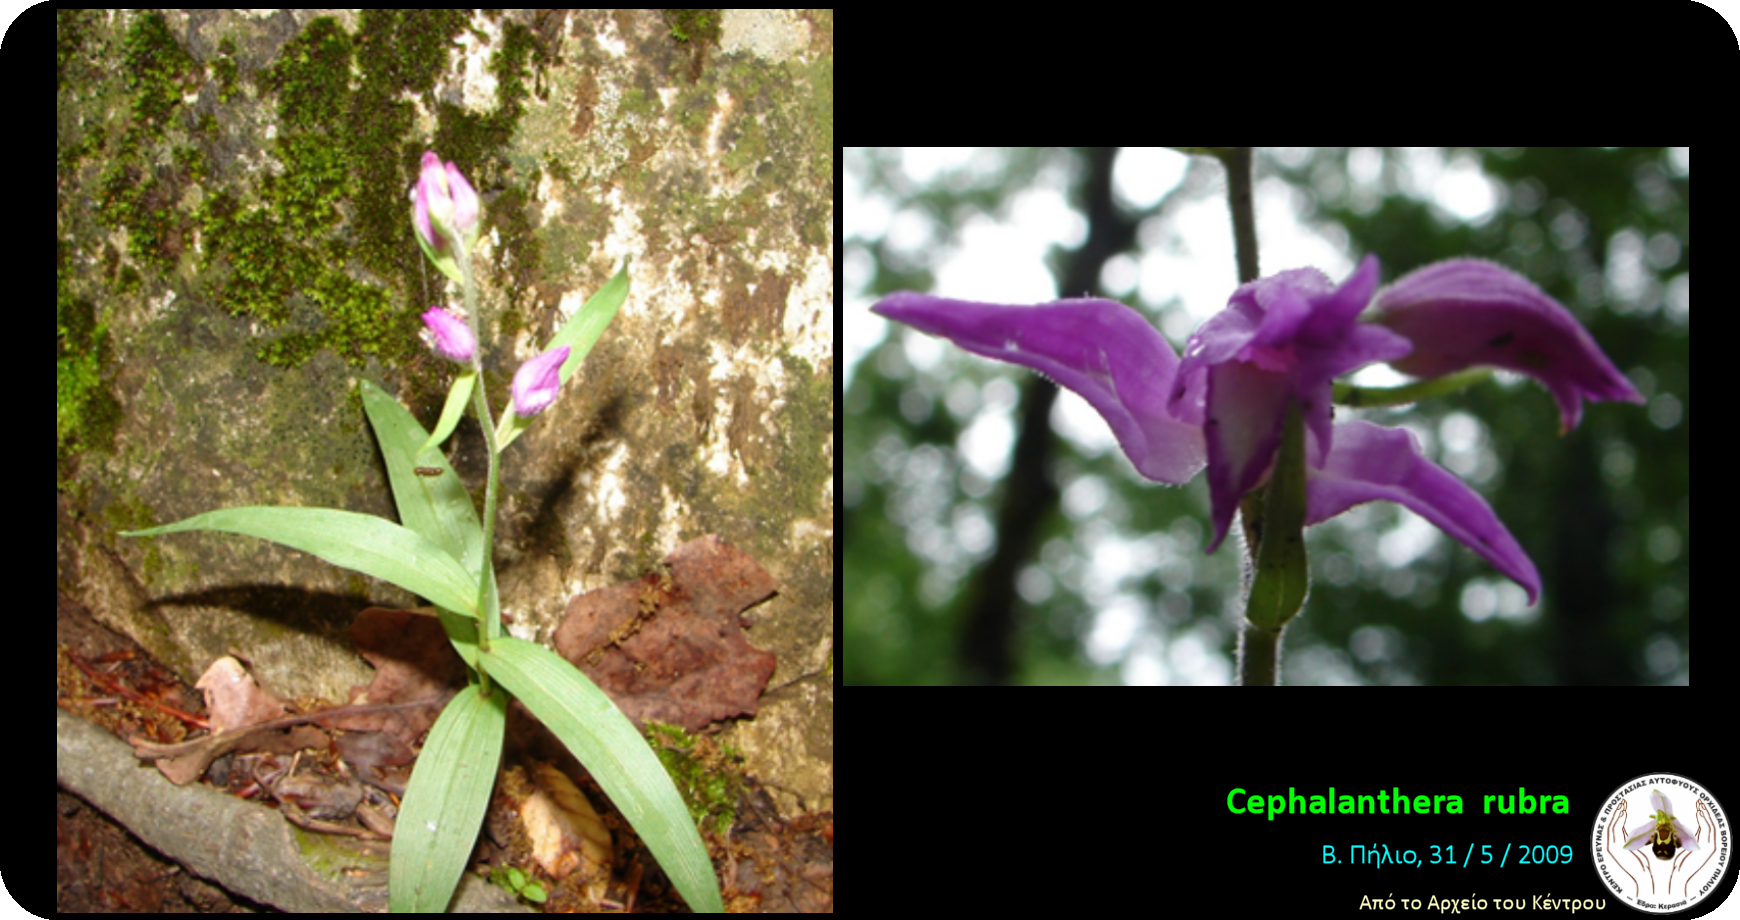 Cephalanthera rubra.png